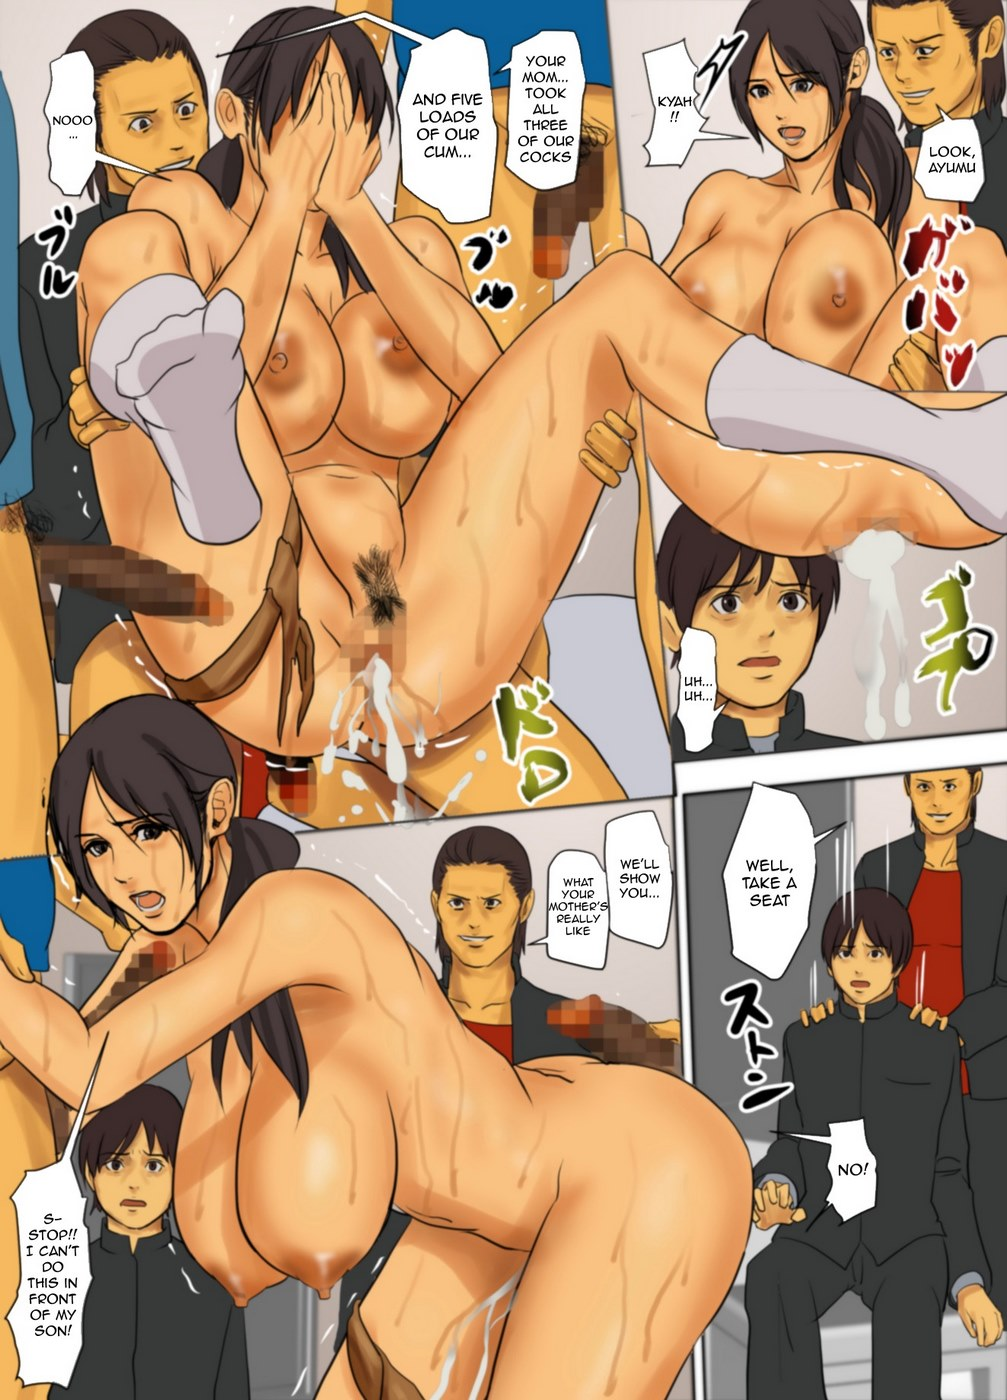 Naruto sexe hardcore xxx gratuitement